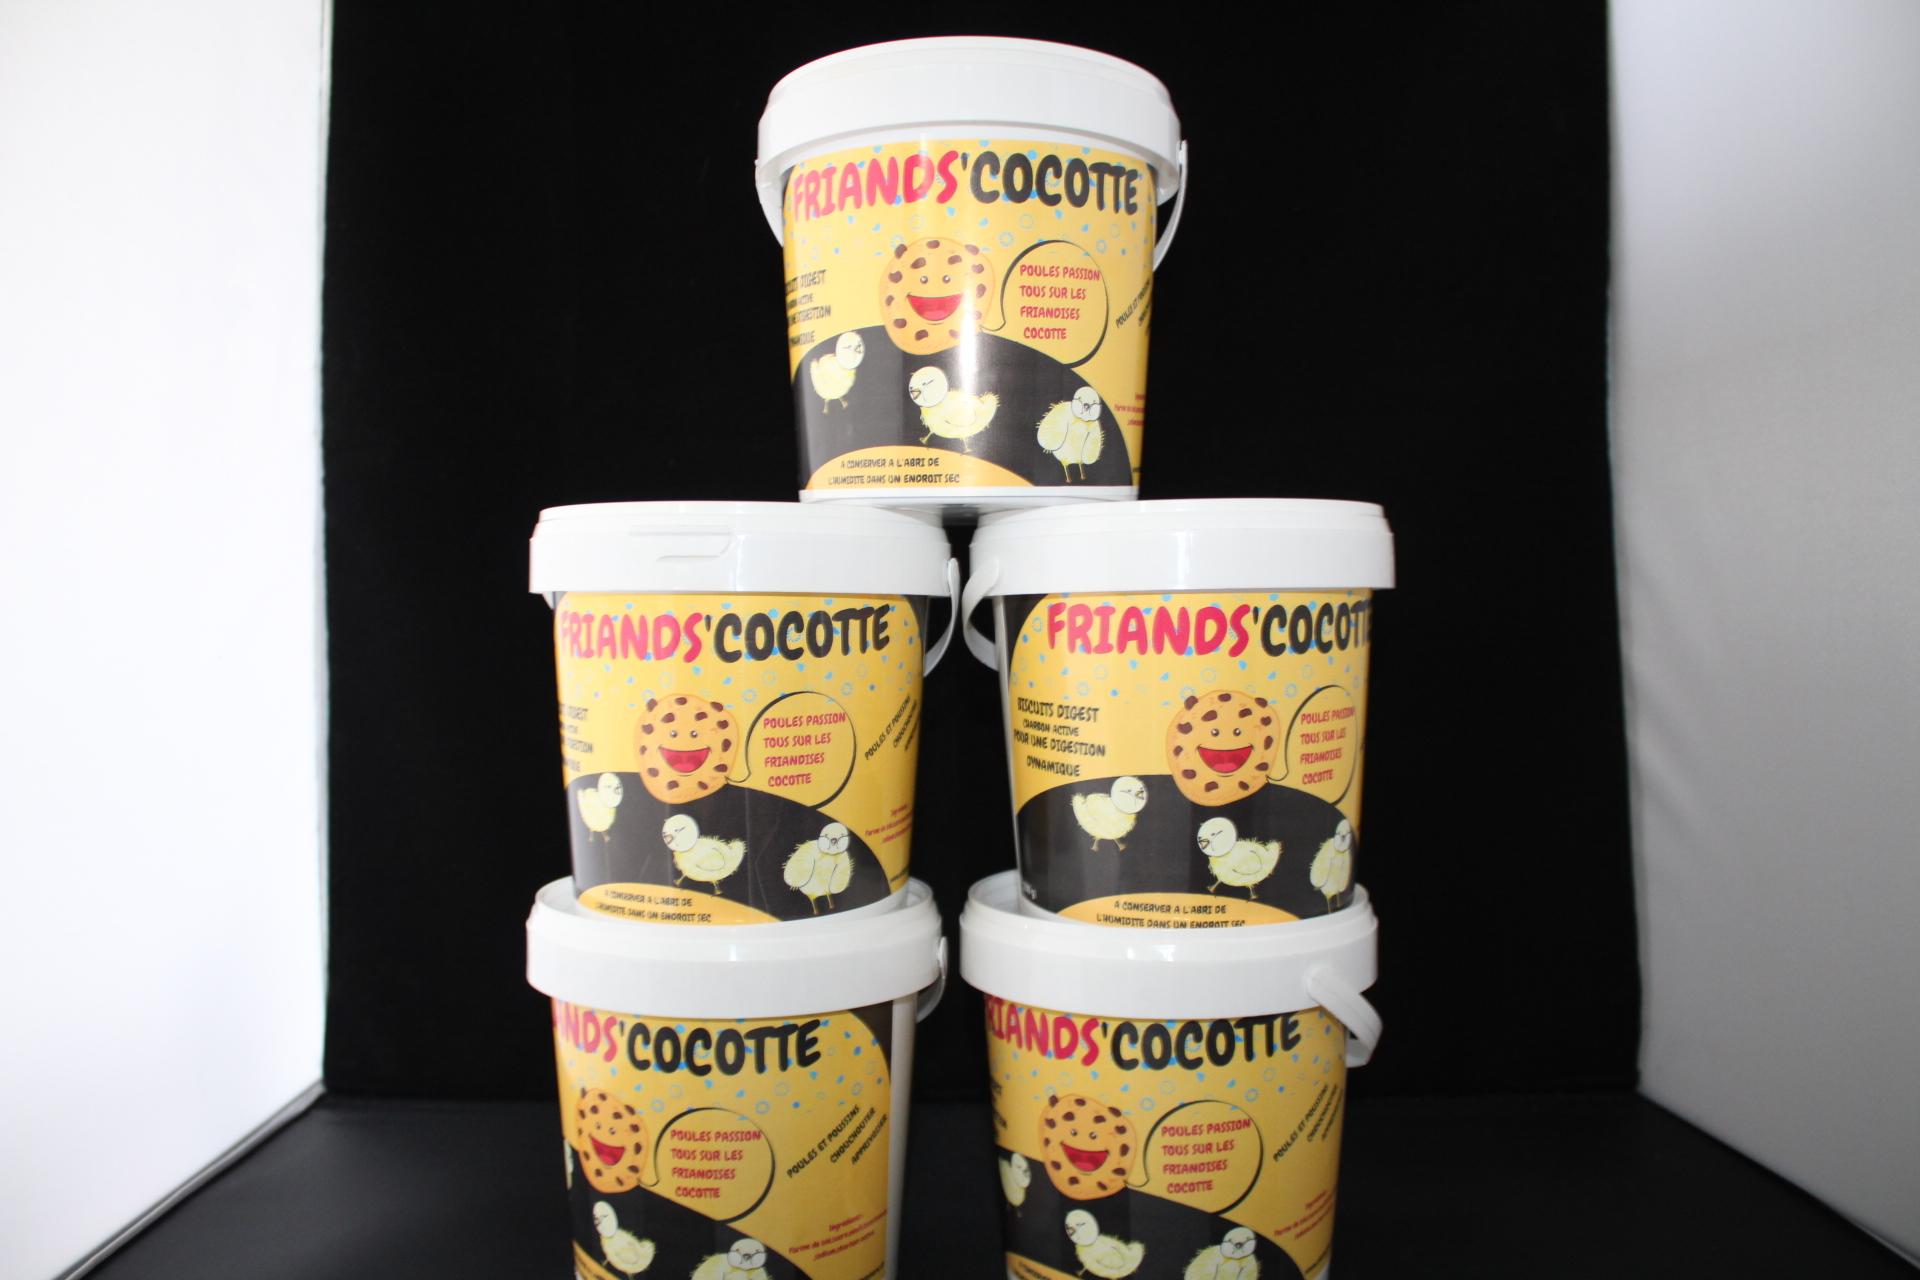 Friands\'cocotte digest